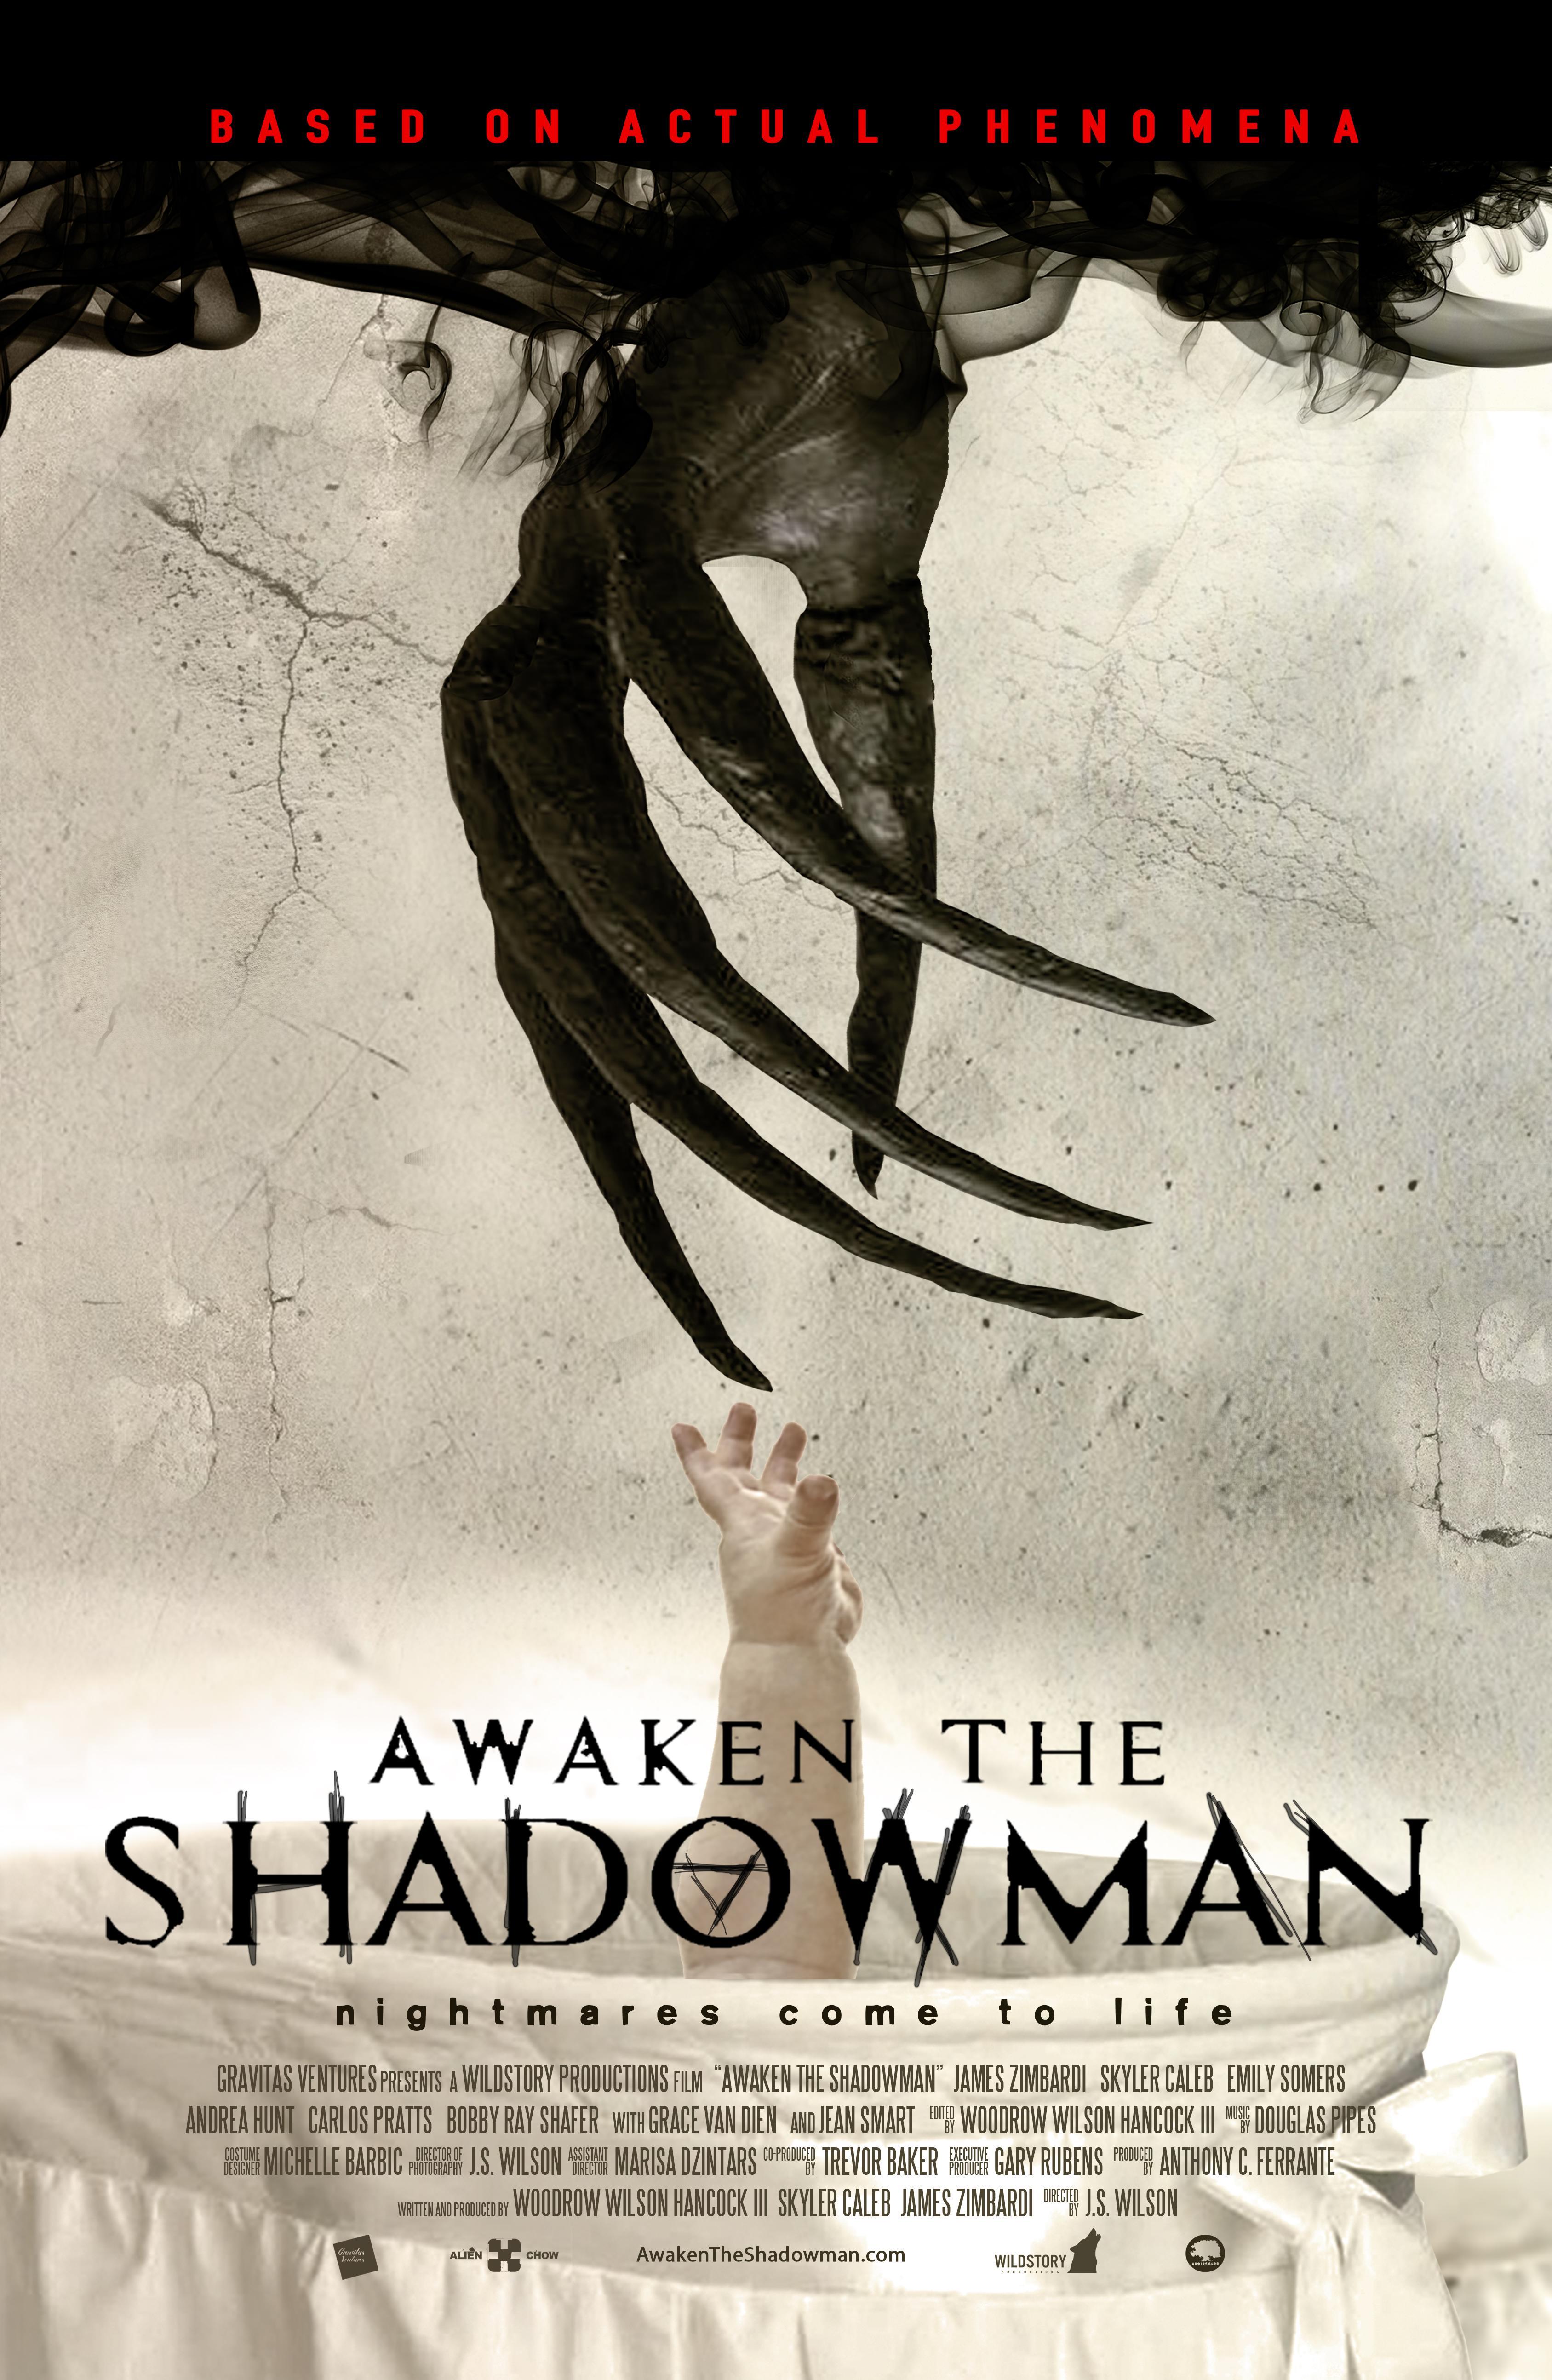 Awaken-the-Shadowman-movie-poster